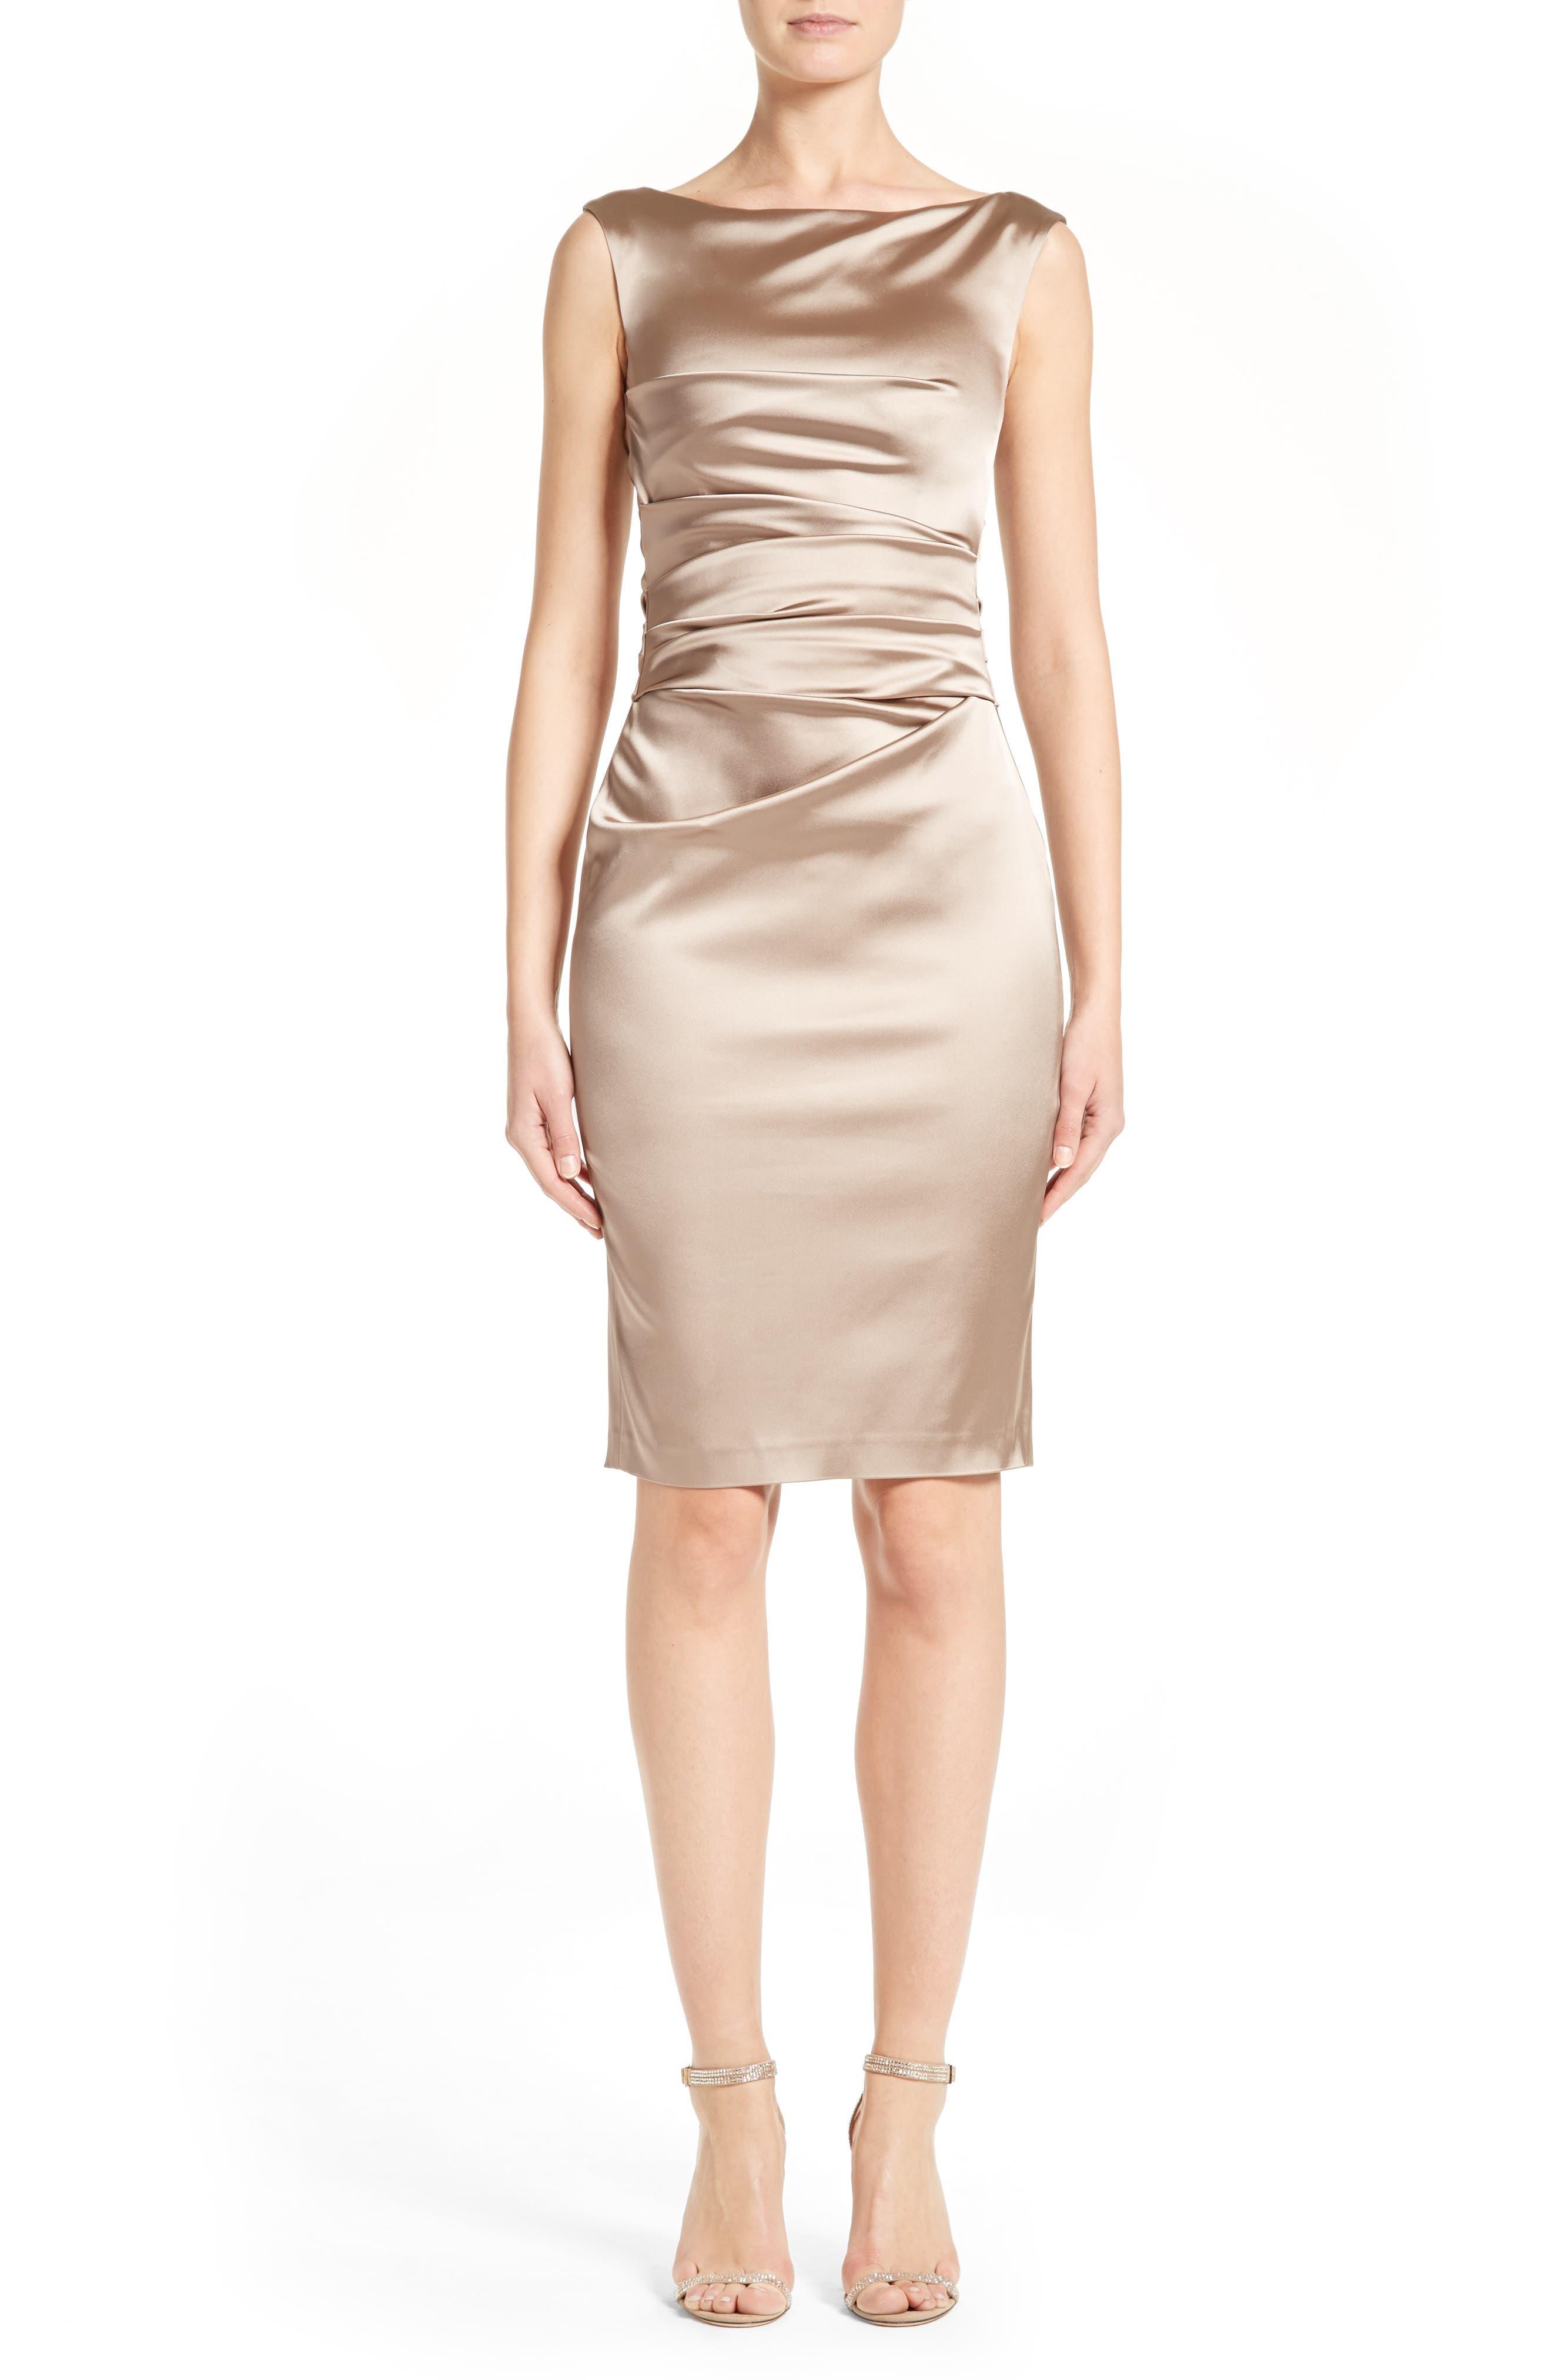 Alternate Image 1 Selected - Talbot Runhof Stretch Satin Sheath Dress